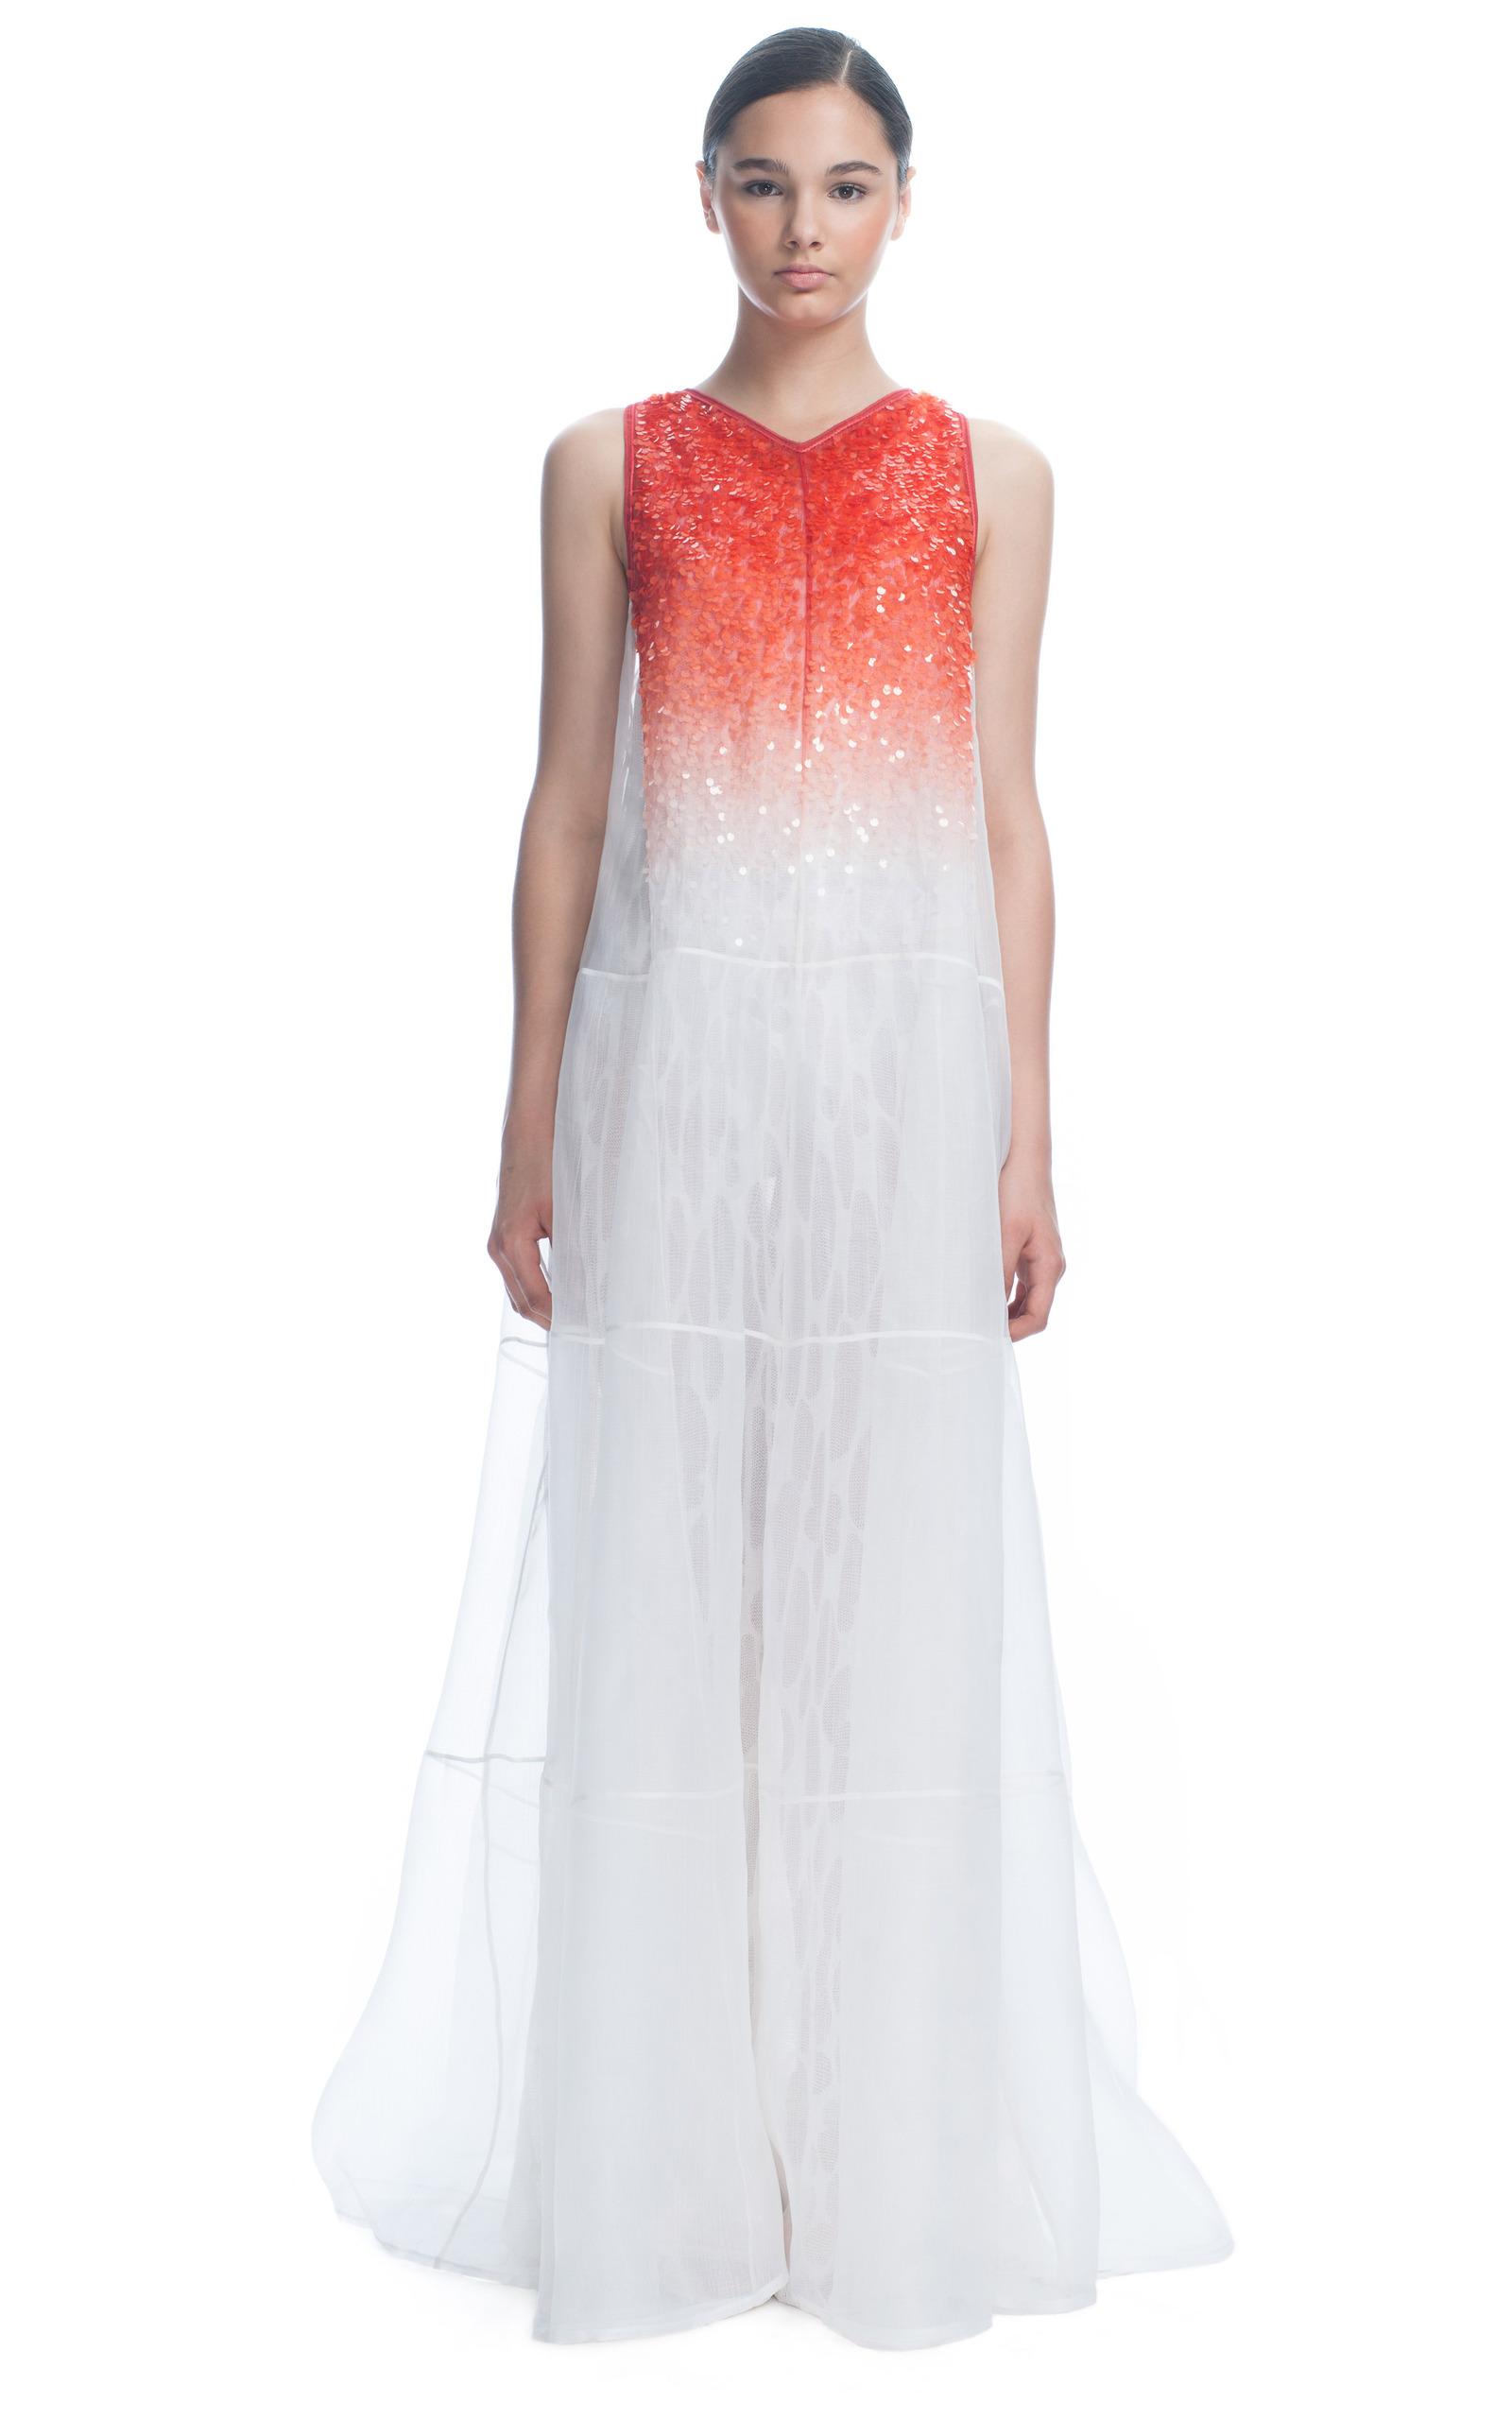 Organza Evening Dress With Ombré Sequins by Missoni | Moda Operandi